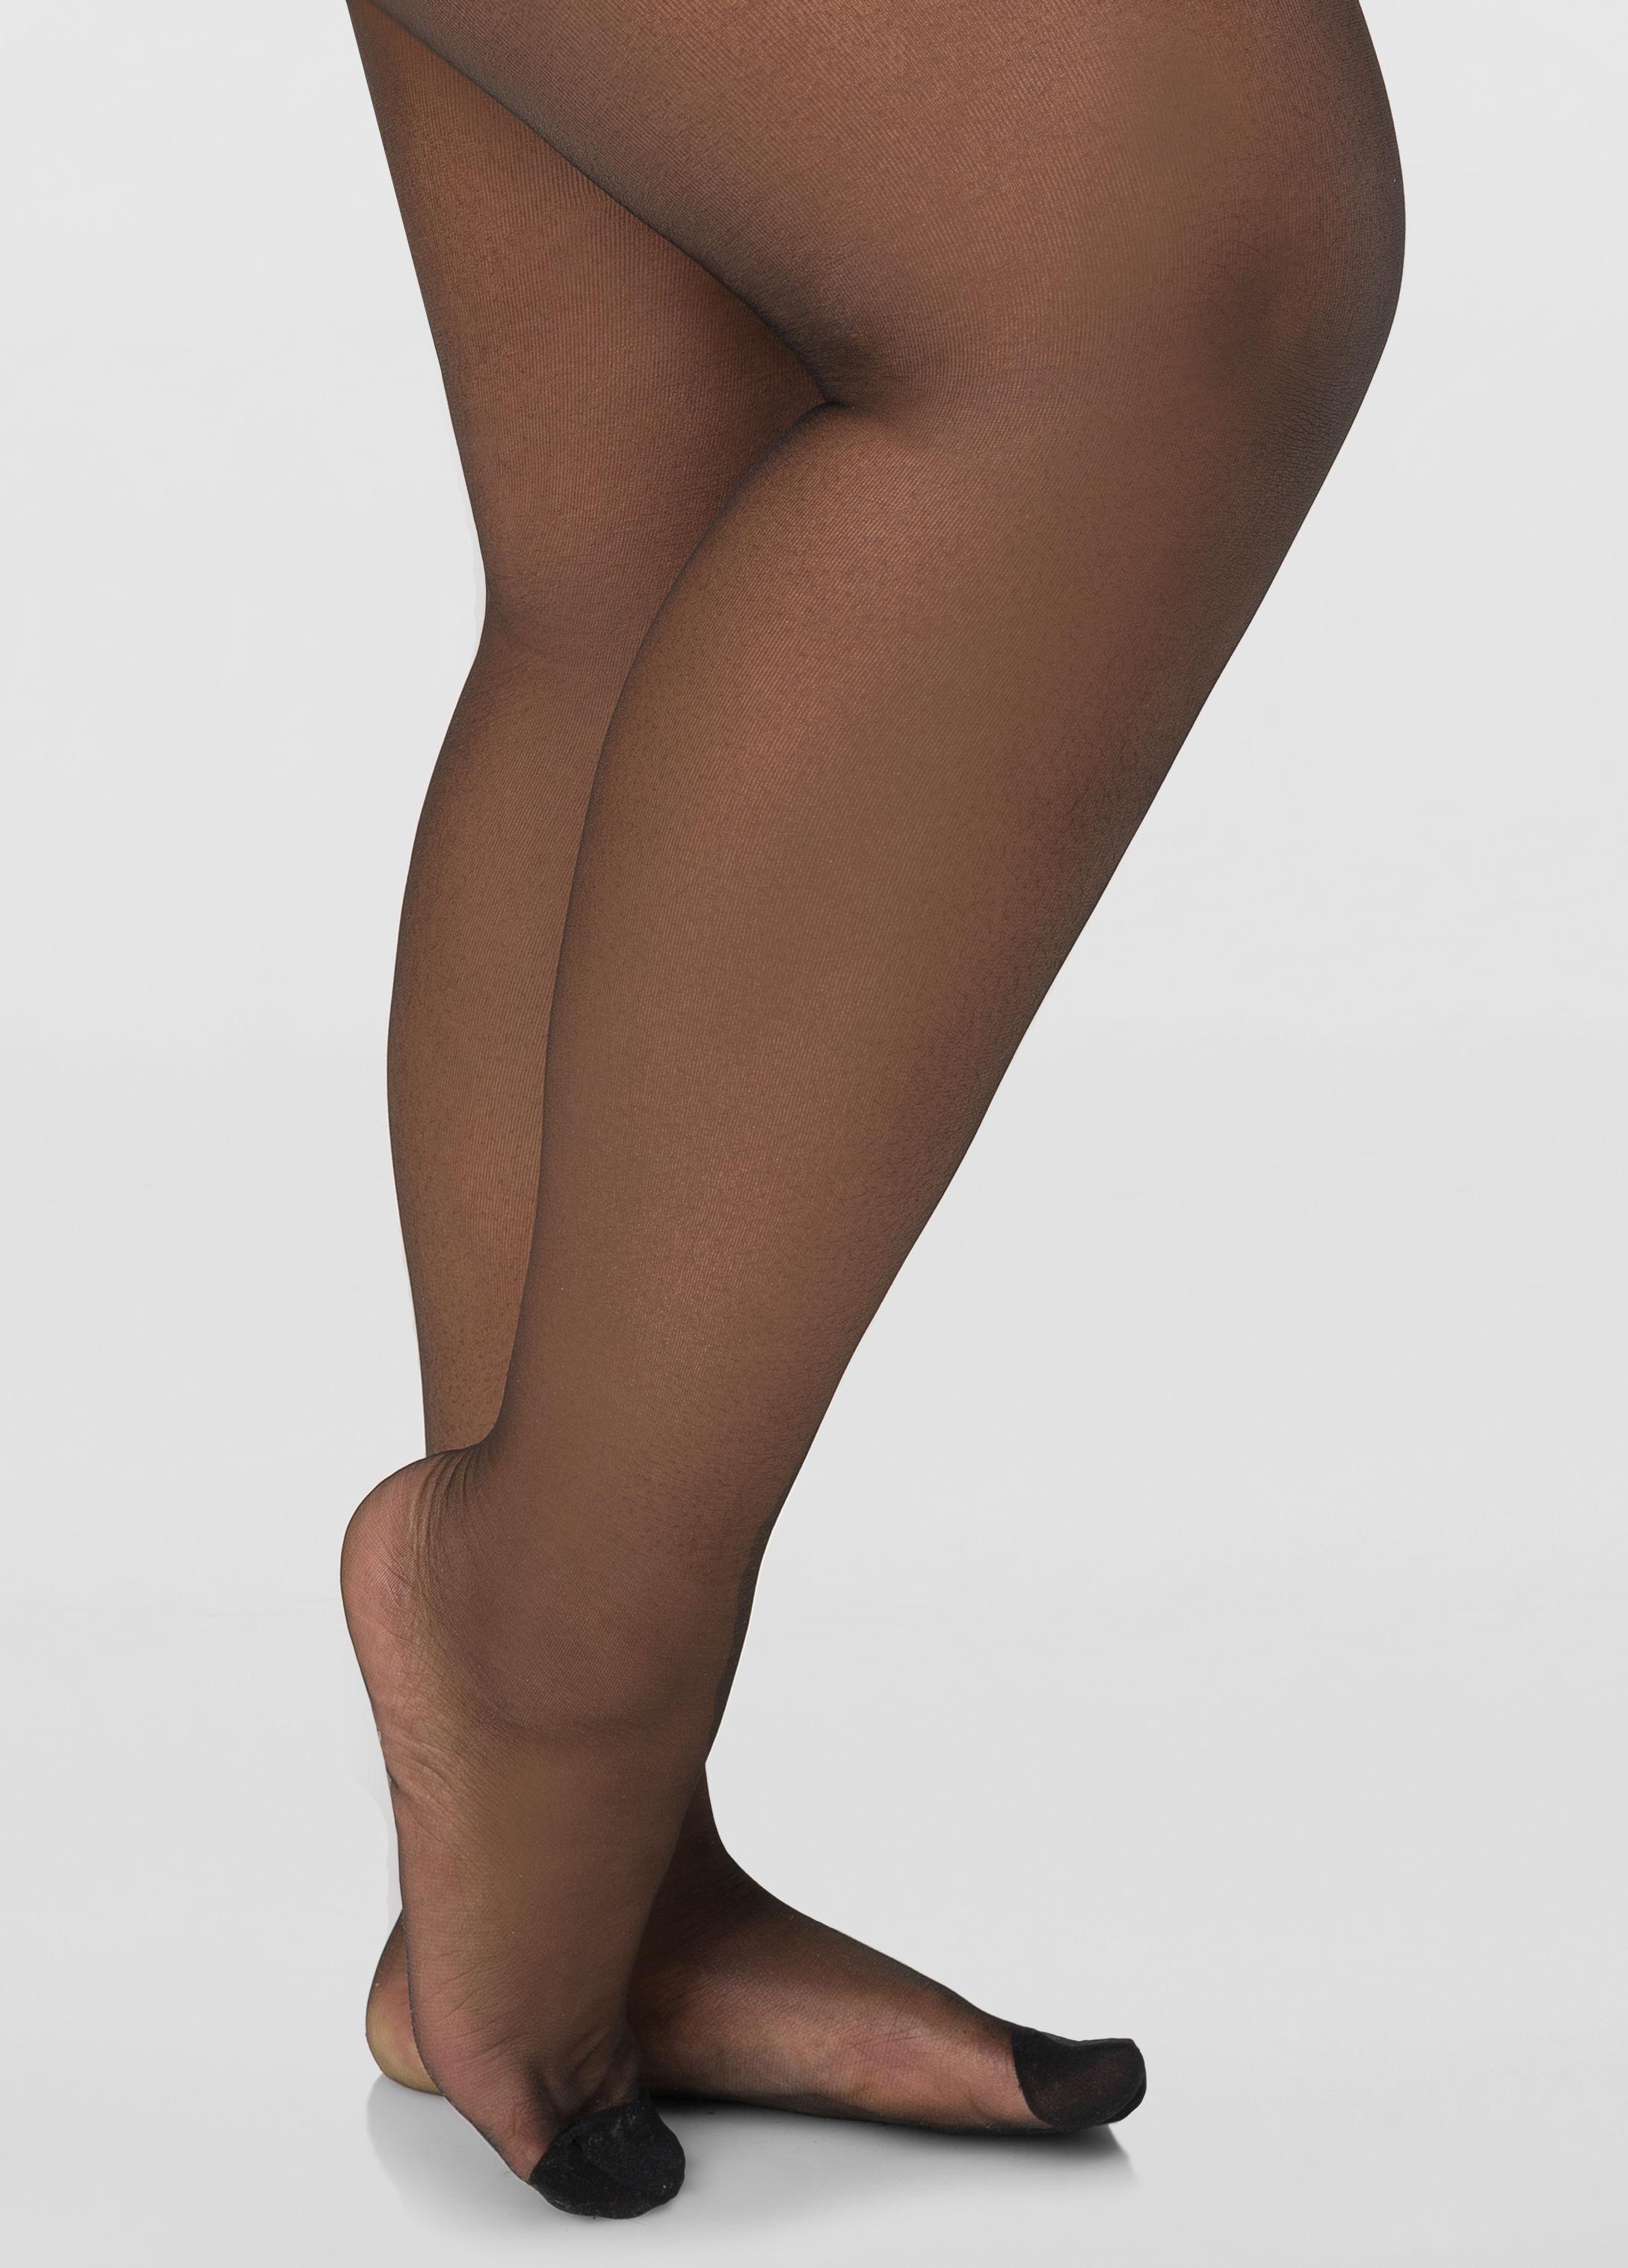 fde976a38 Ashley Stewart. Women s Plus Size Berkshire Reinforced Toe Control Top  Ultra Sheer Pantyhose